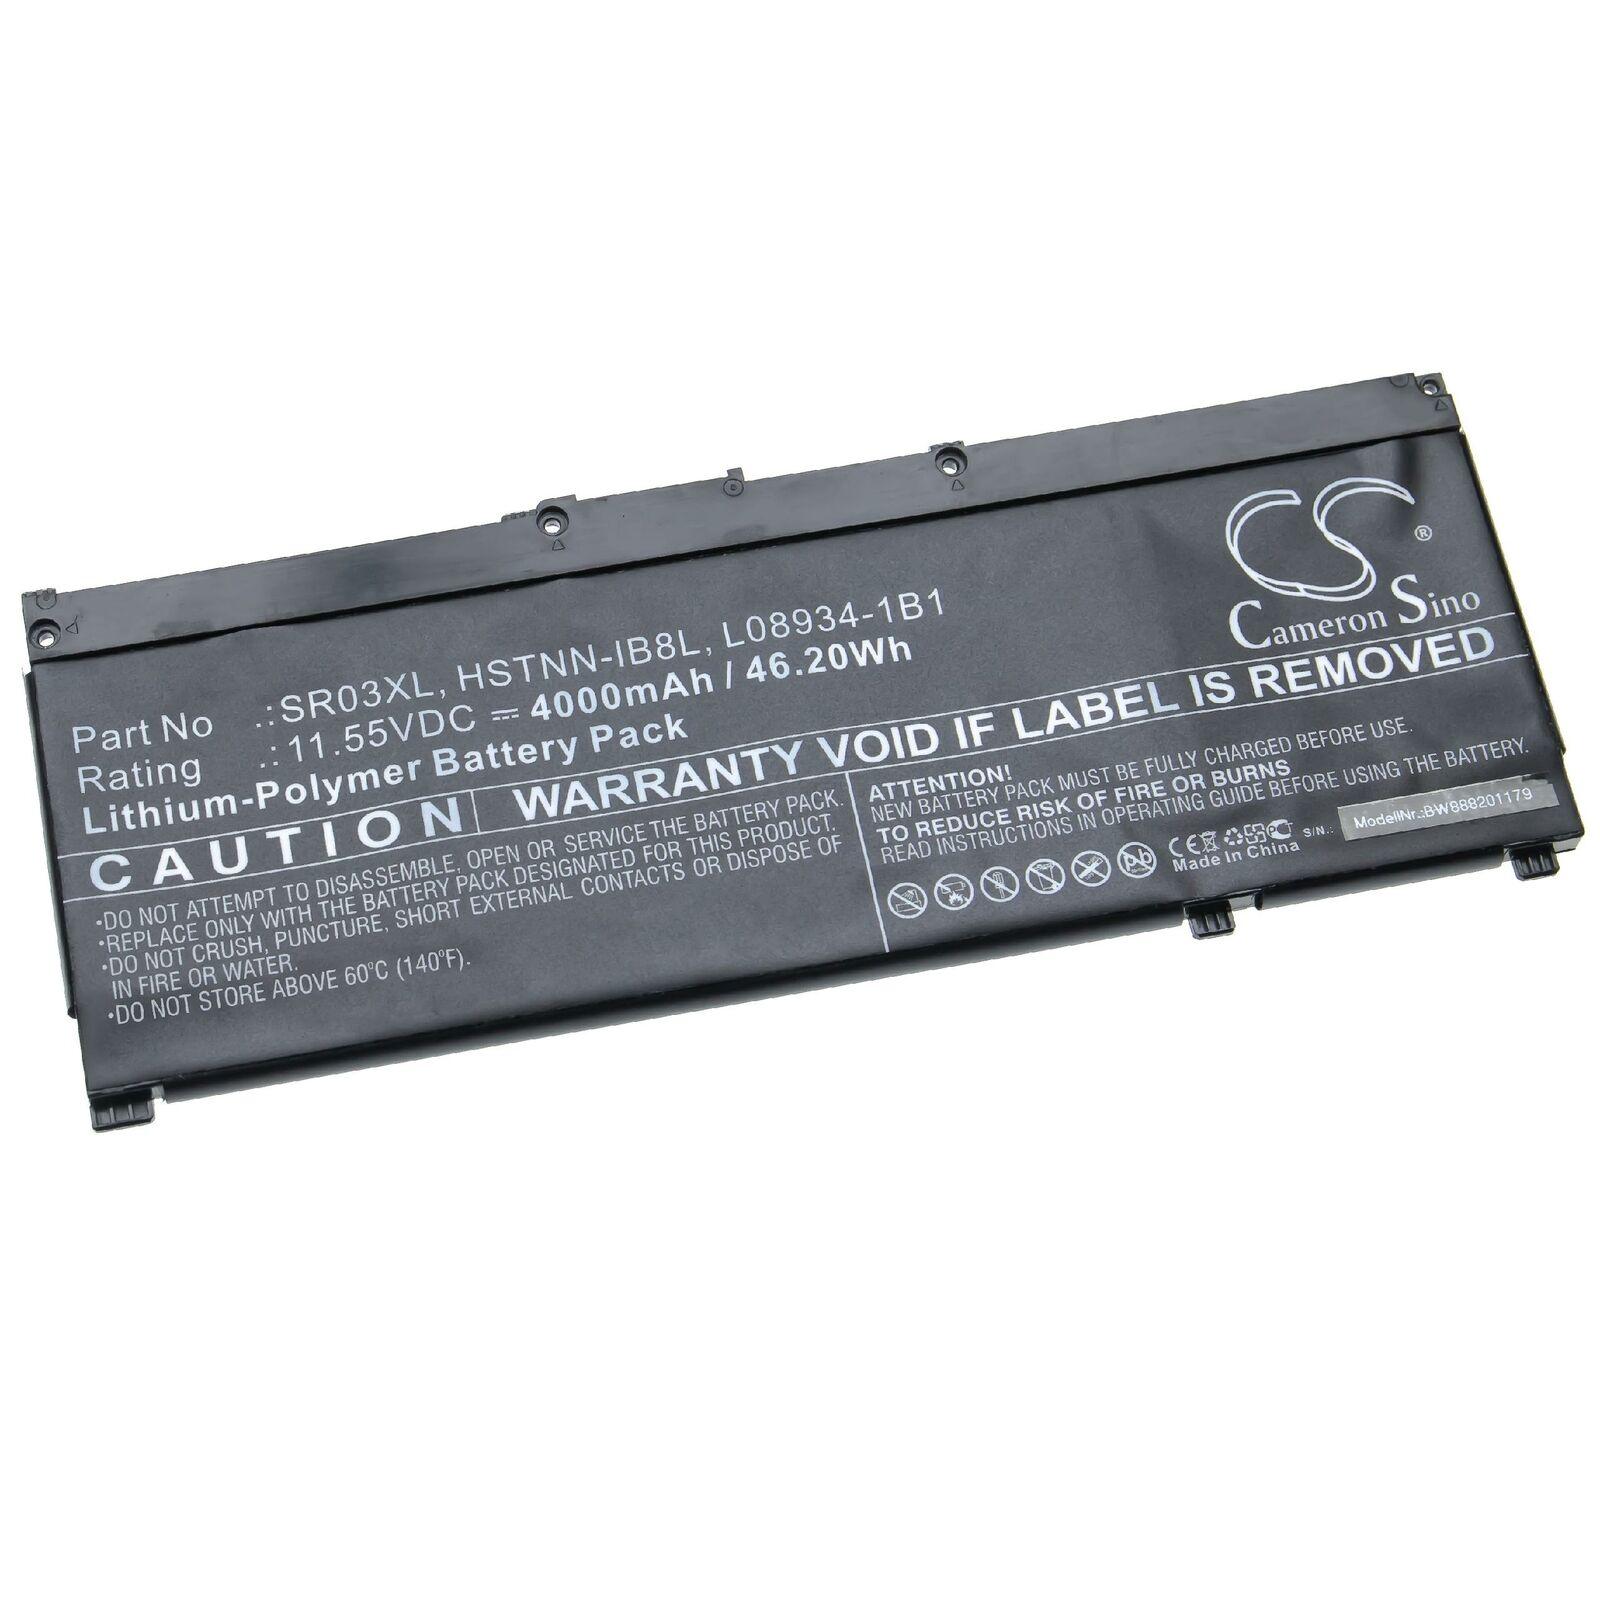 HP Pavilion 15-CX 15-cx0020nr L08855-855 HSTNN-IB8L SR03XL batteria compatibile